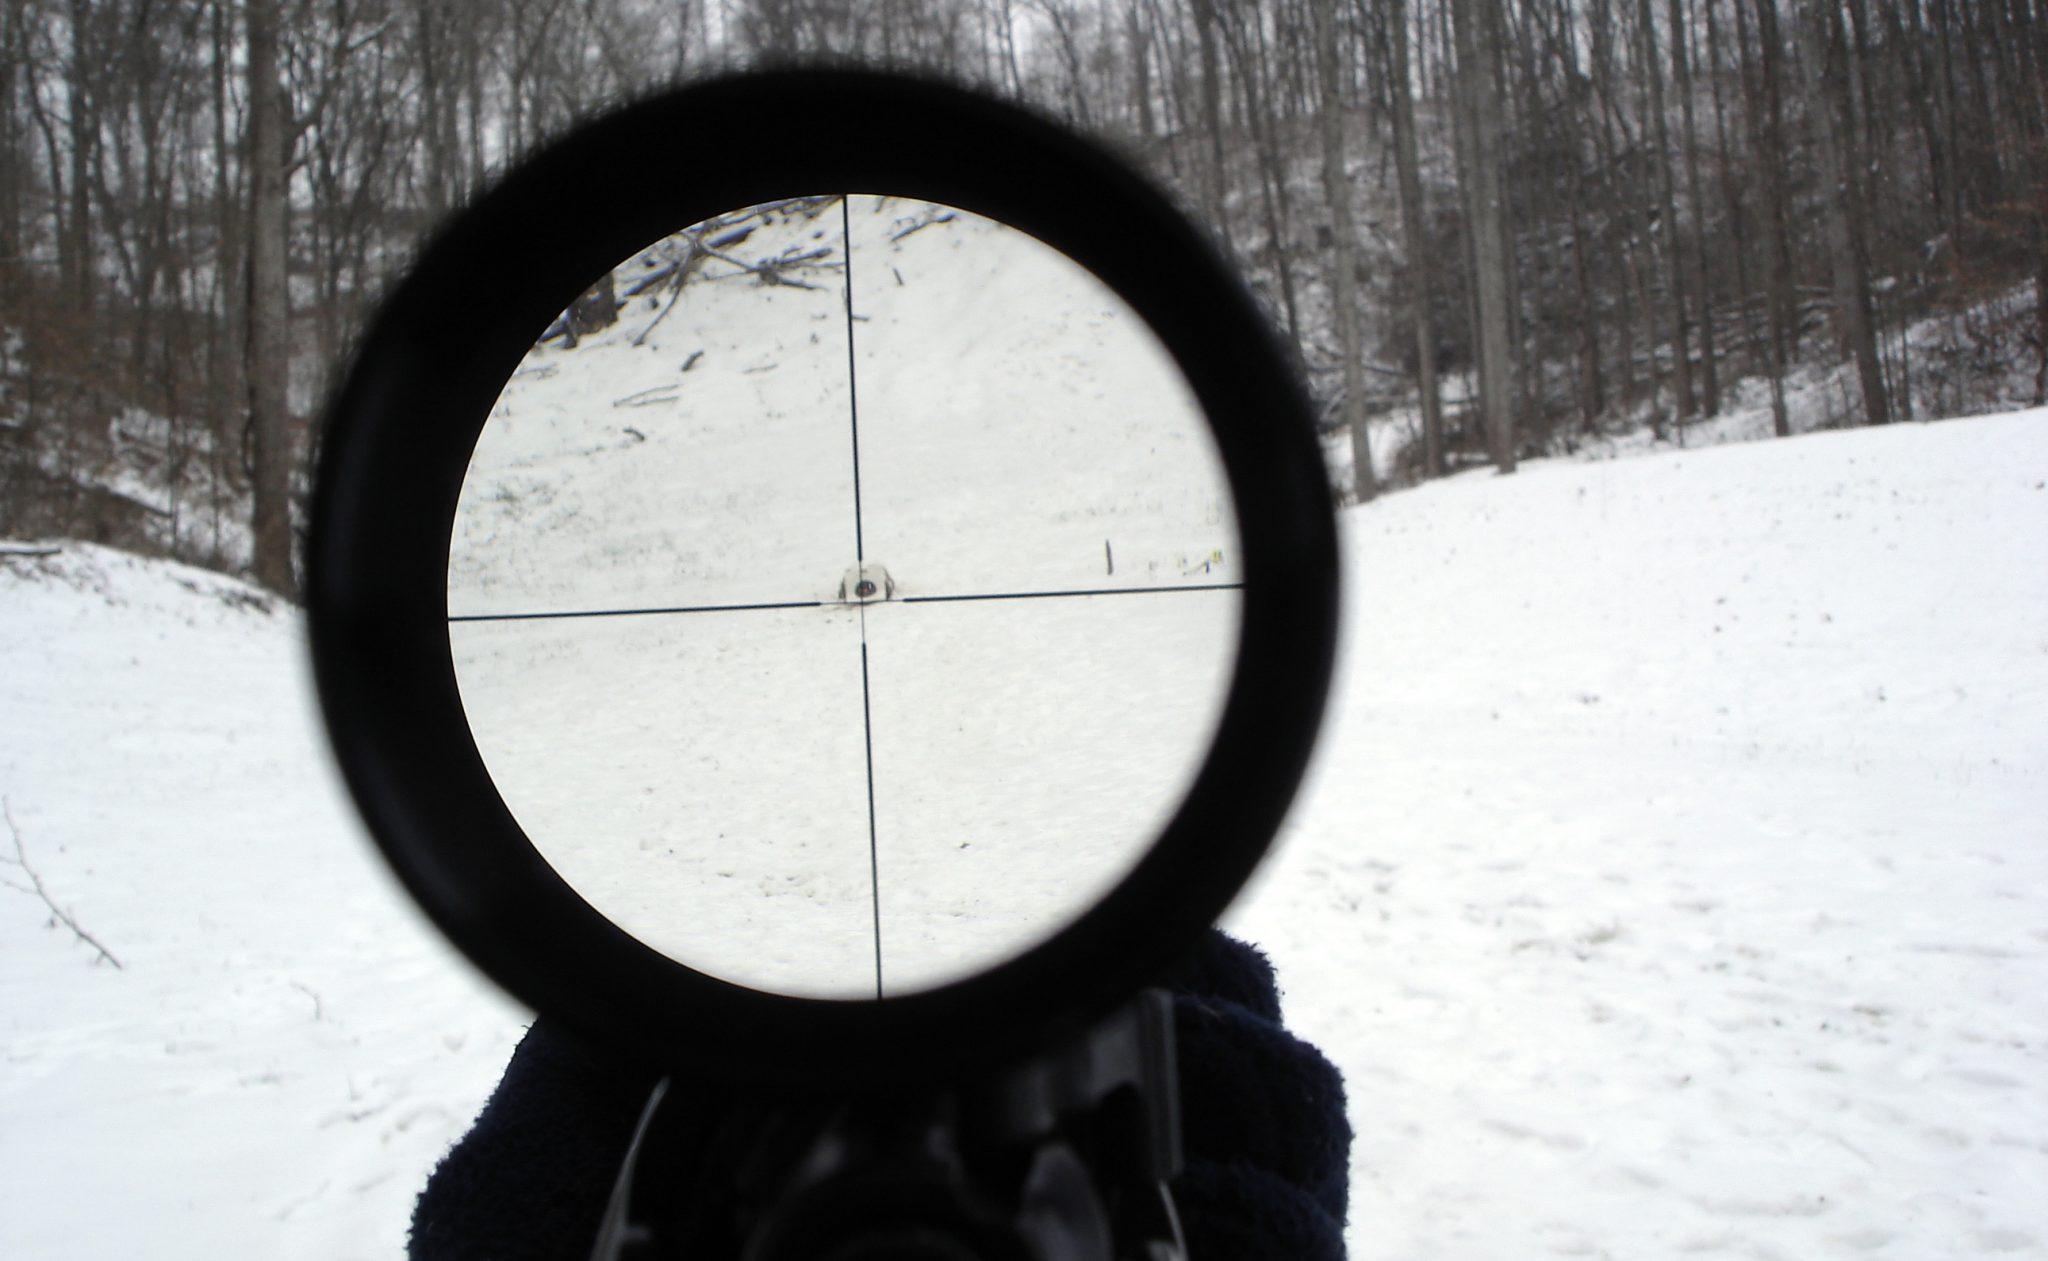 operational riflescope